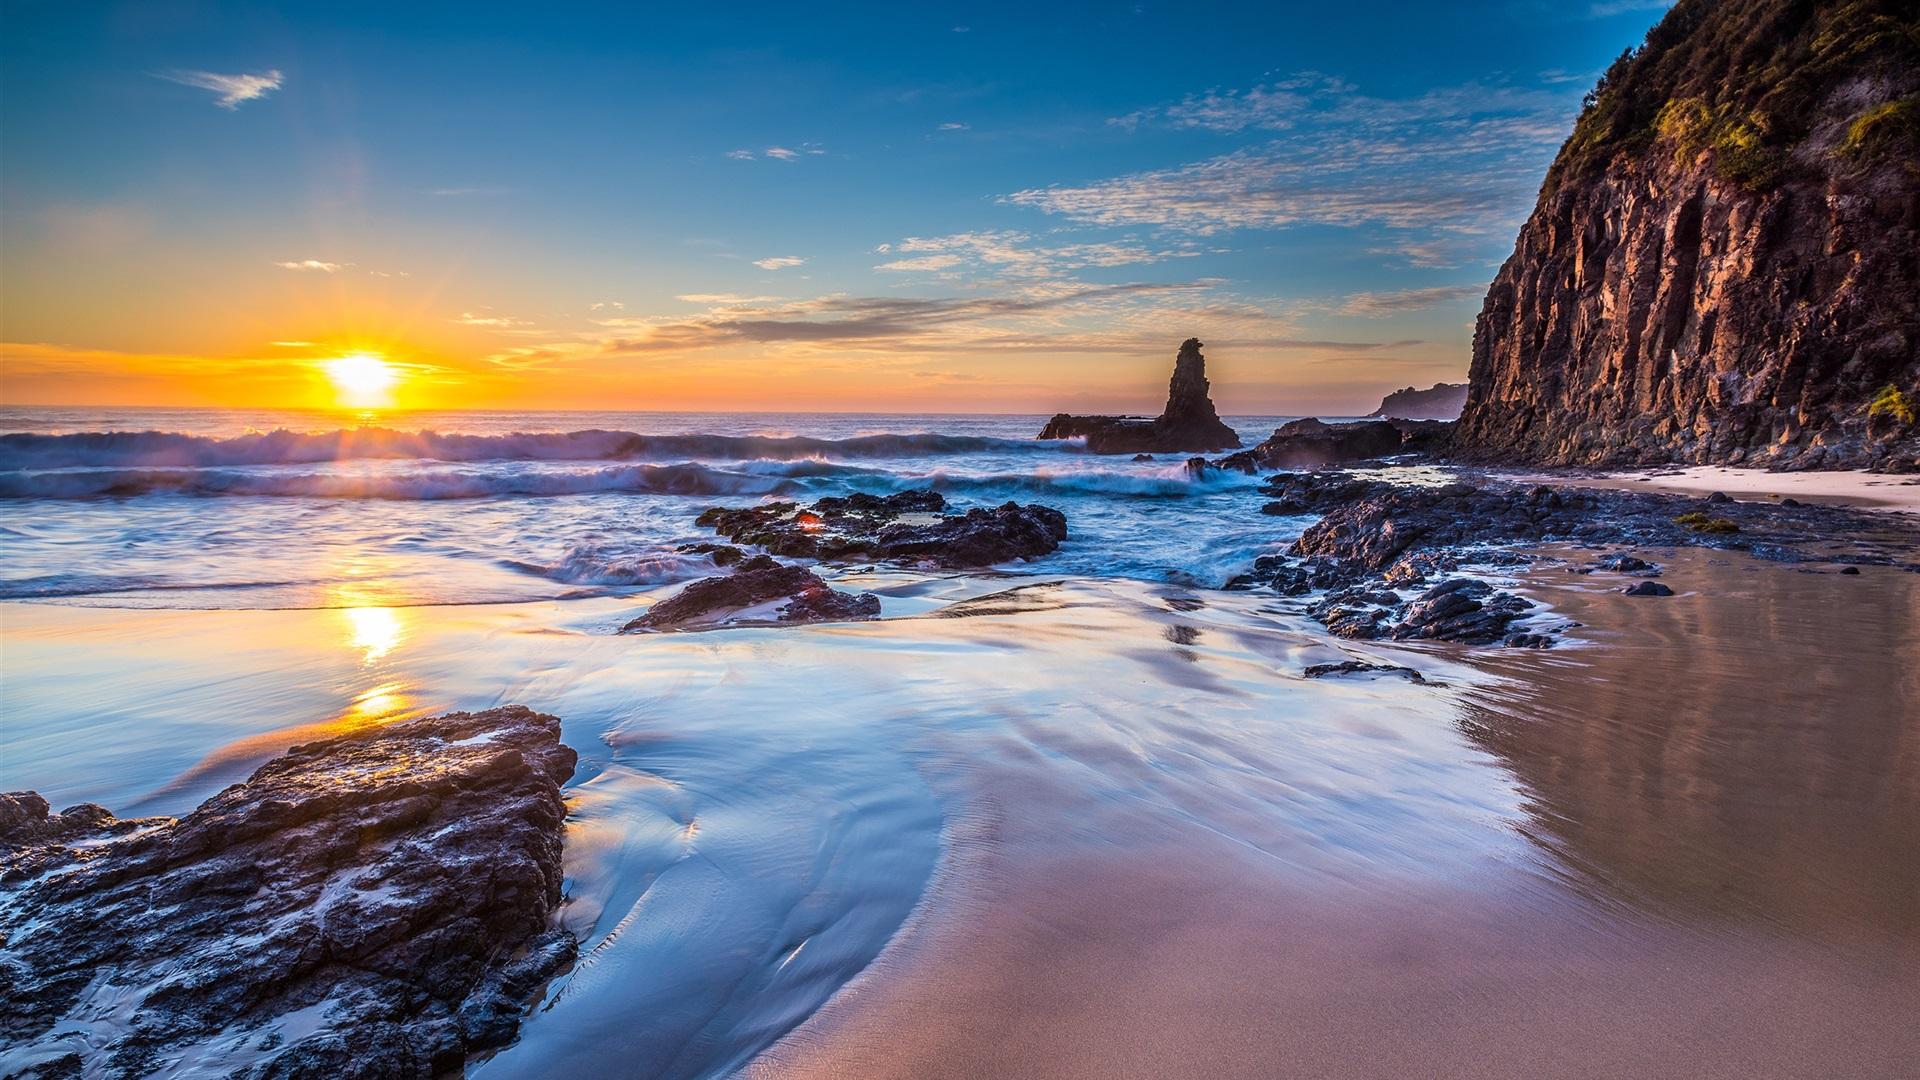 10 New Hawaii Beach Pictures Wallpapers Full Hd 1920 1080: 壁紙 ジョーンズビーチ、キアマダウンズ、ニューサウスウェールズ、オーストラリア、海、日の出 2560x1600 HD